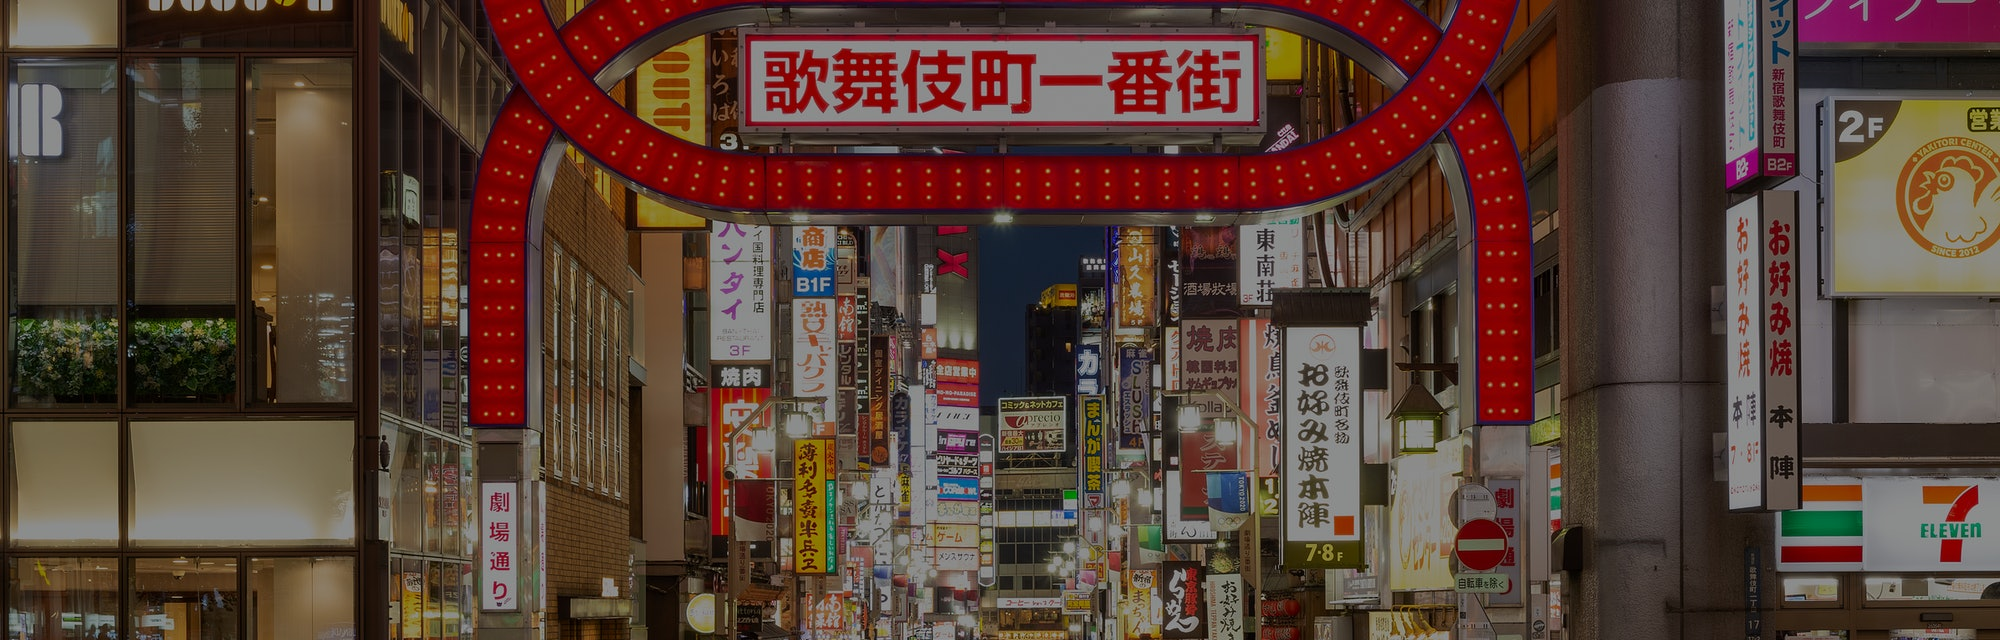 Kabukicho, Tokyo's red-light district